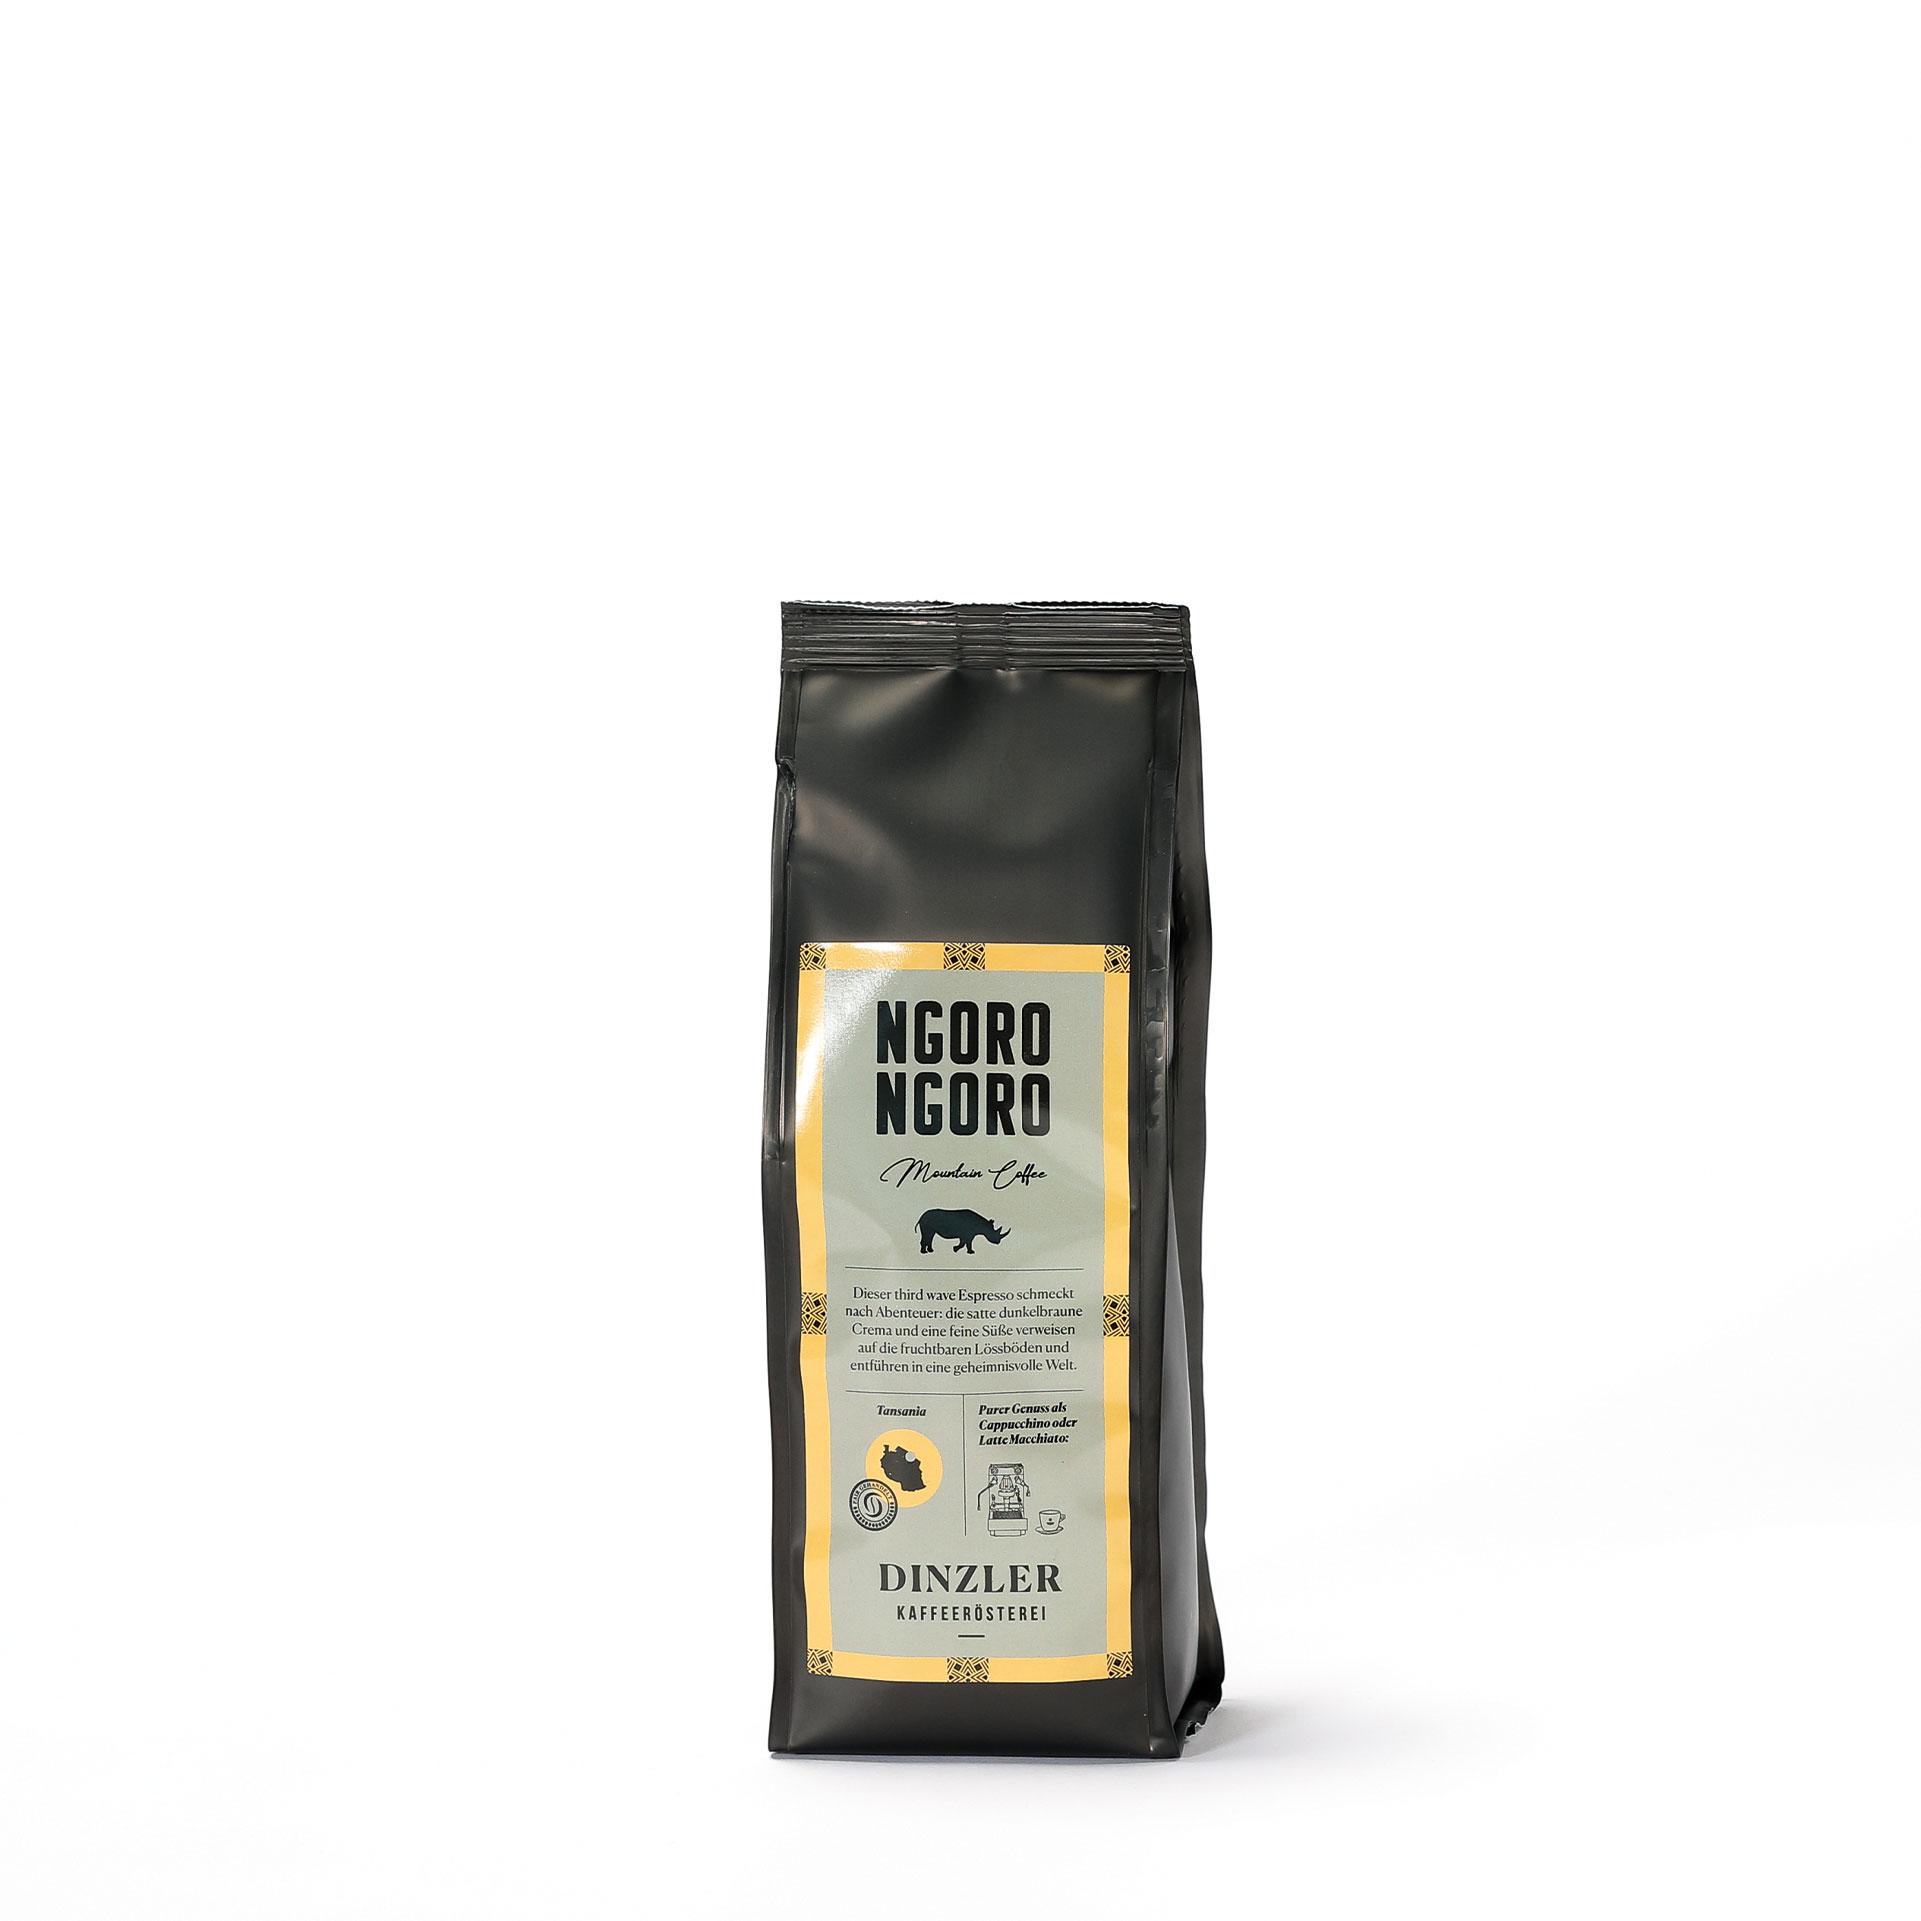 DINZLER Espresso Ngoro Ngoro